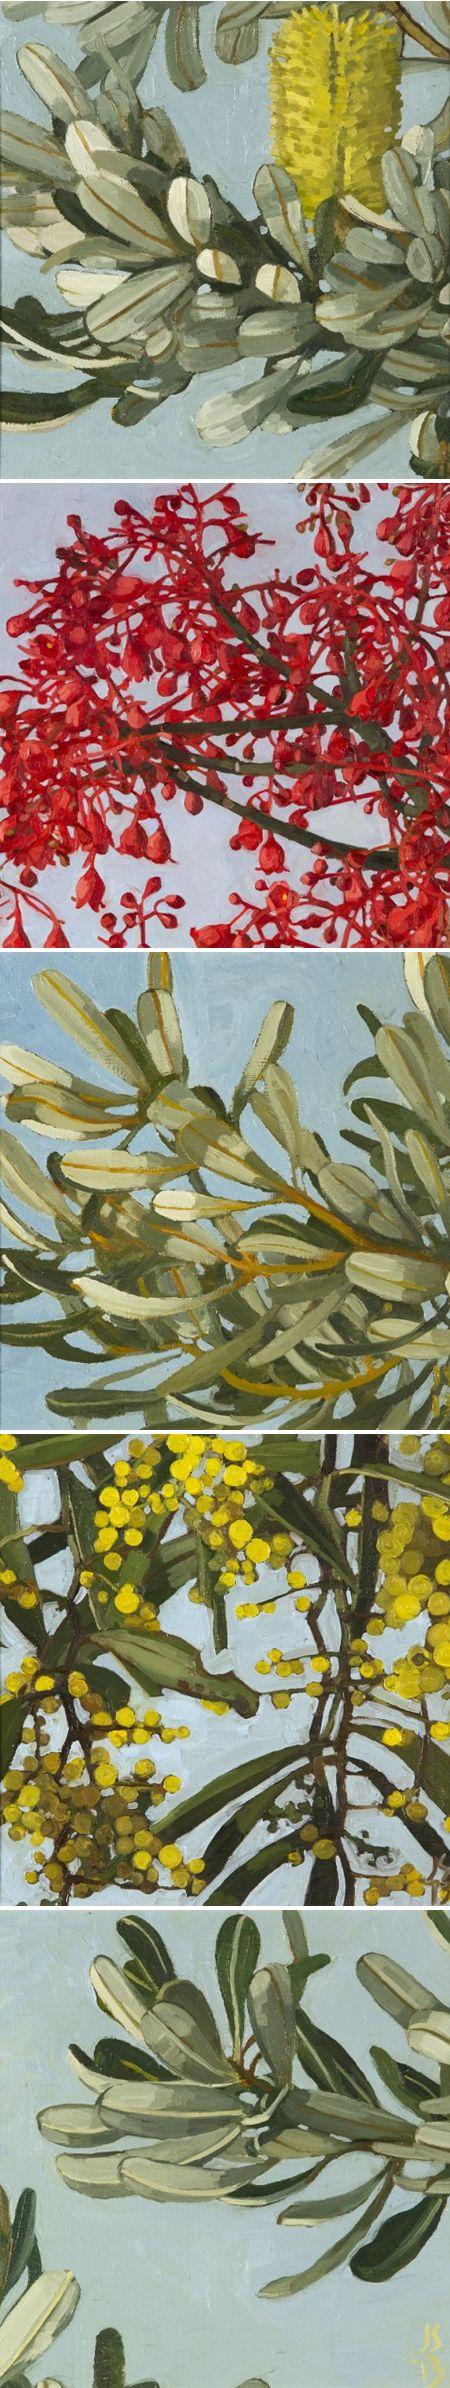 Judith Sinnamon Australian Artist Cant You Tell The Yellow